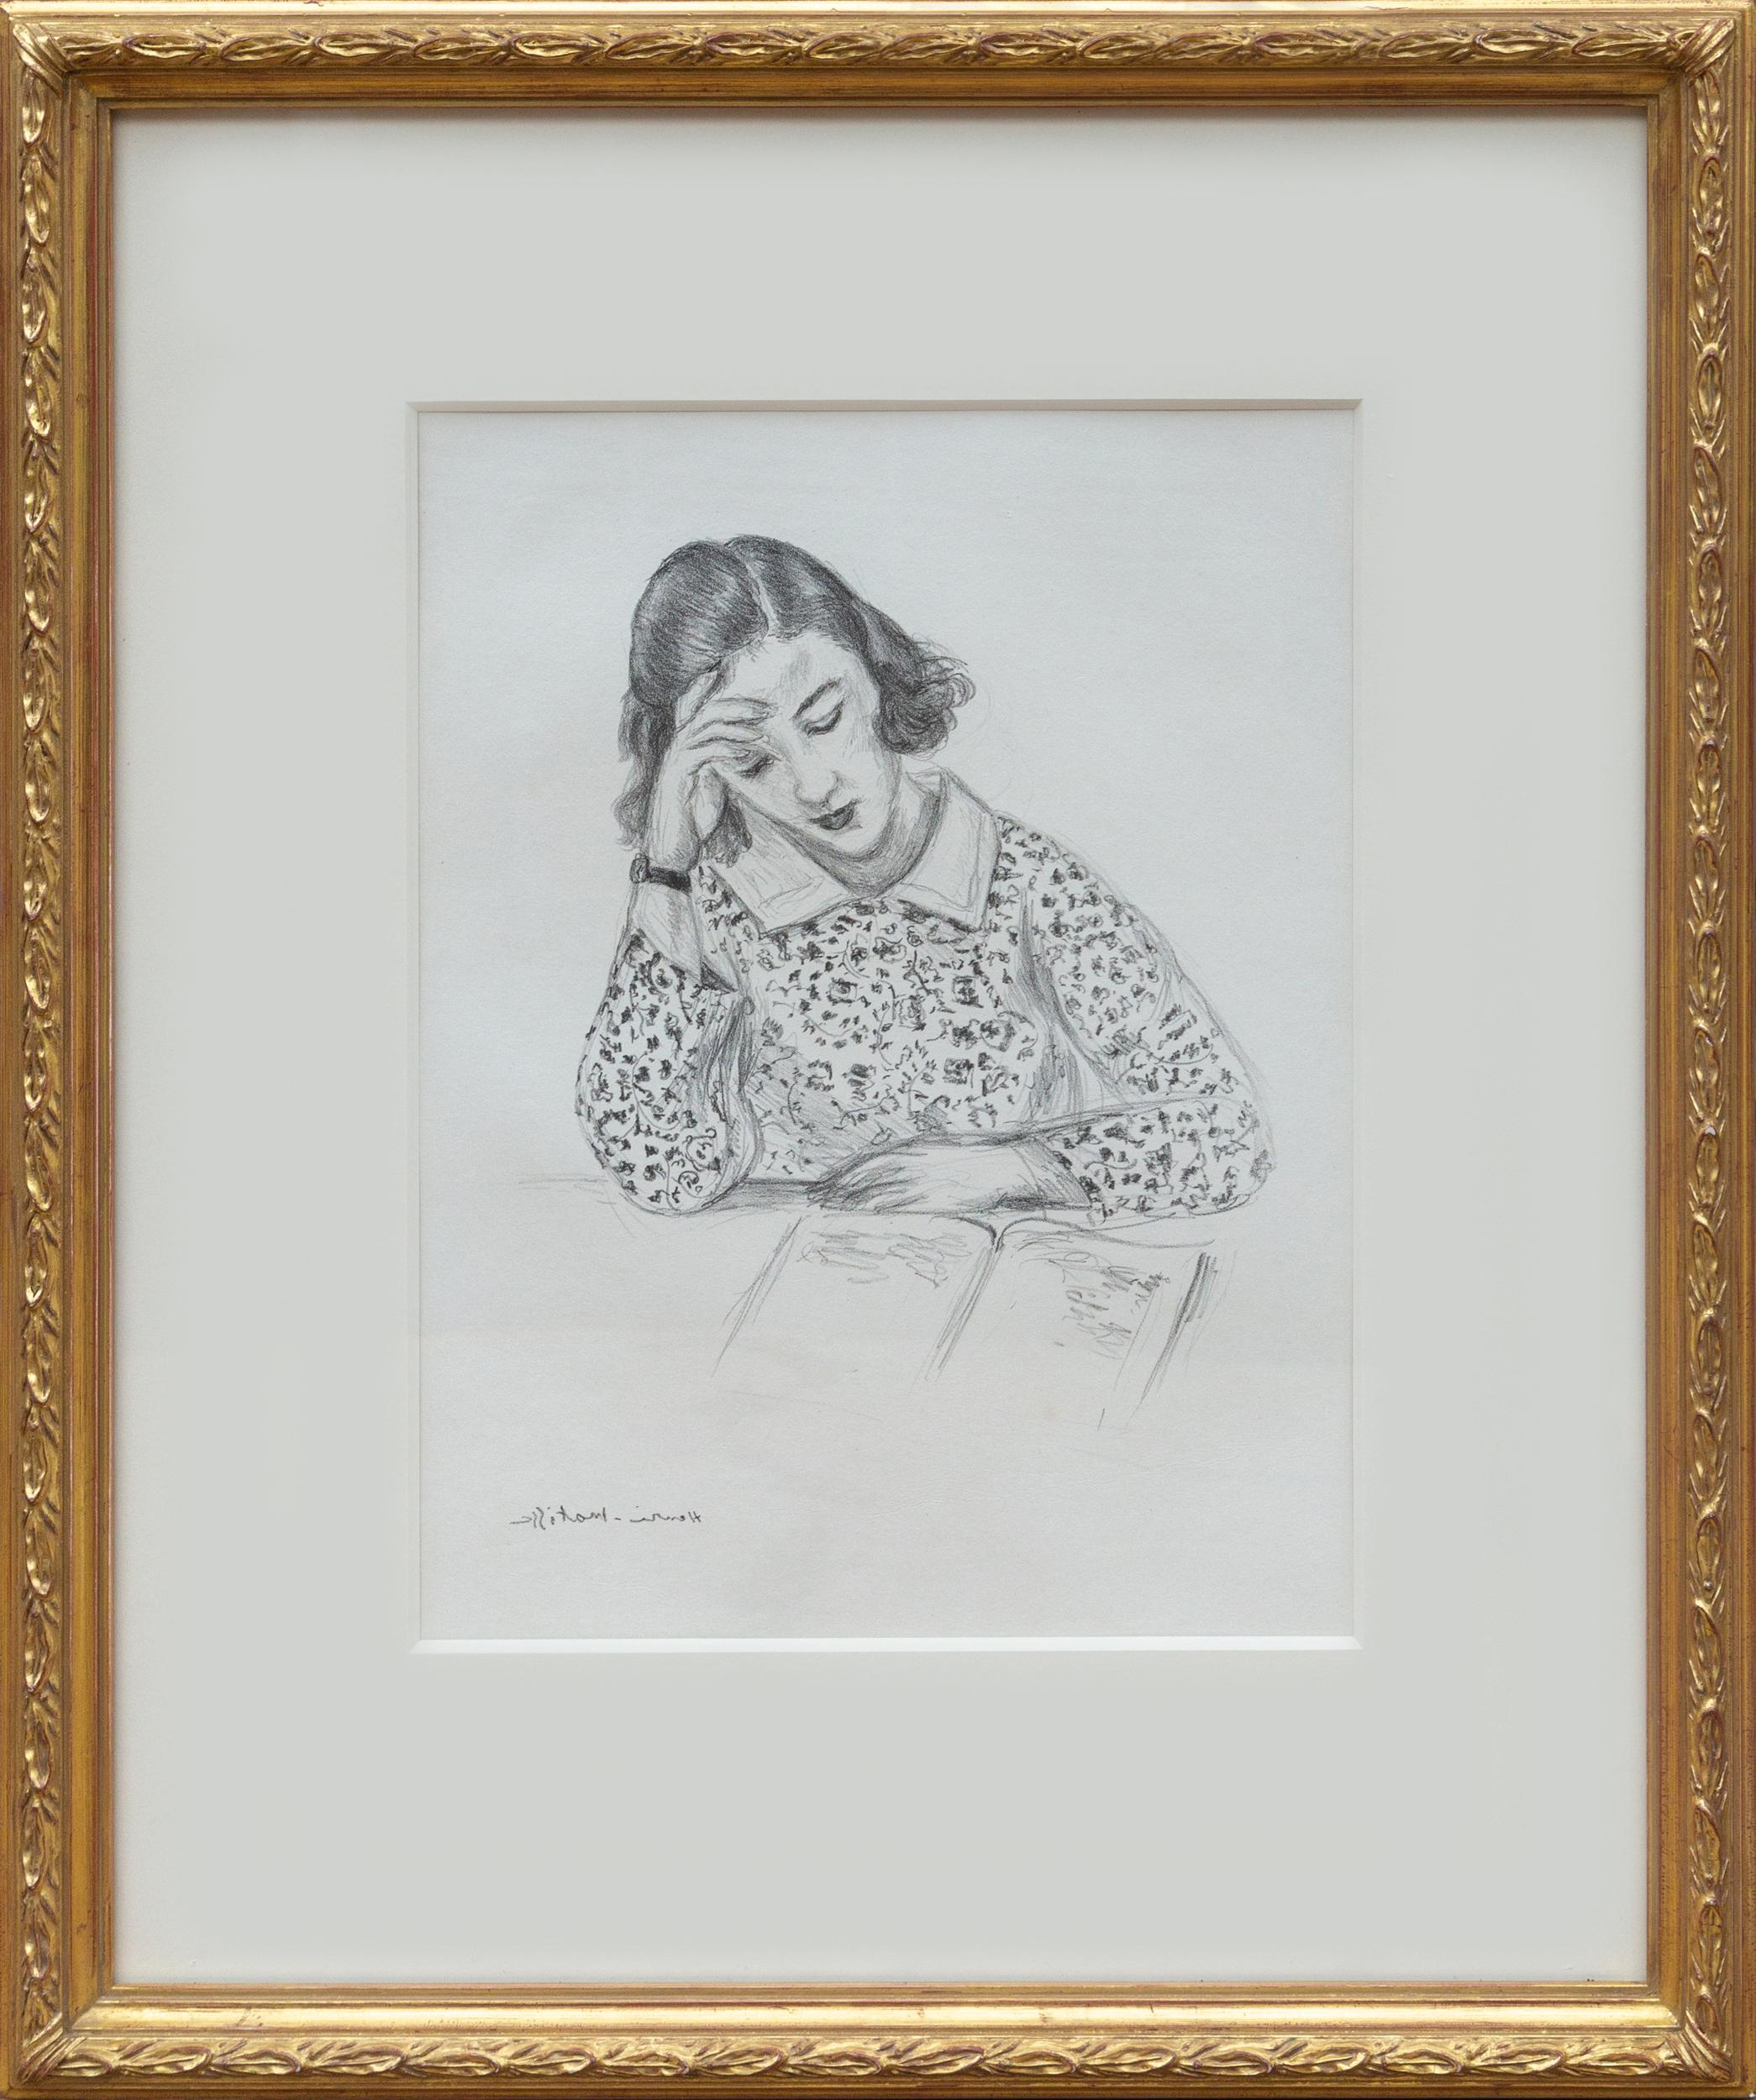 Henri Matisse, La Petite Liseuse, Lithograph